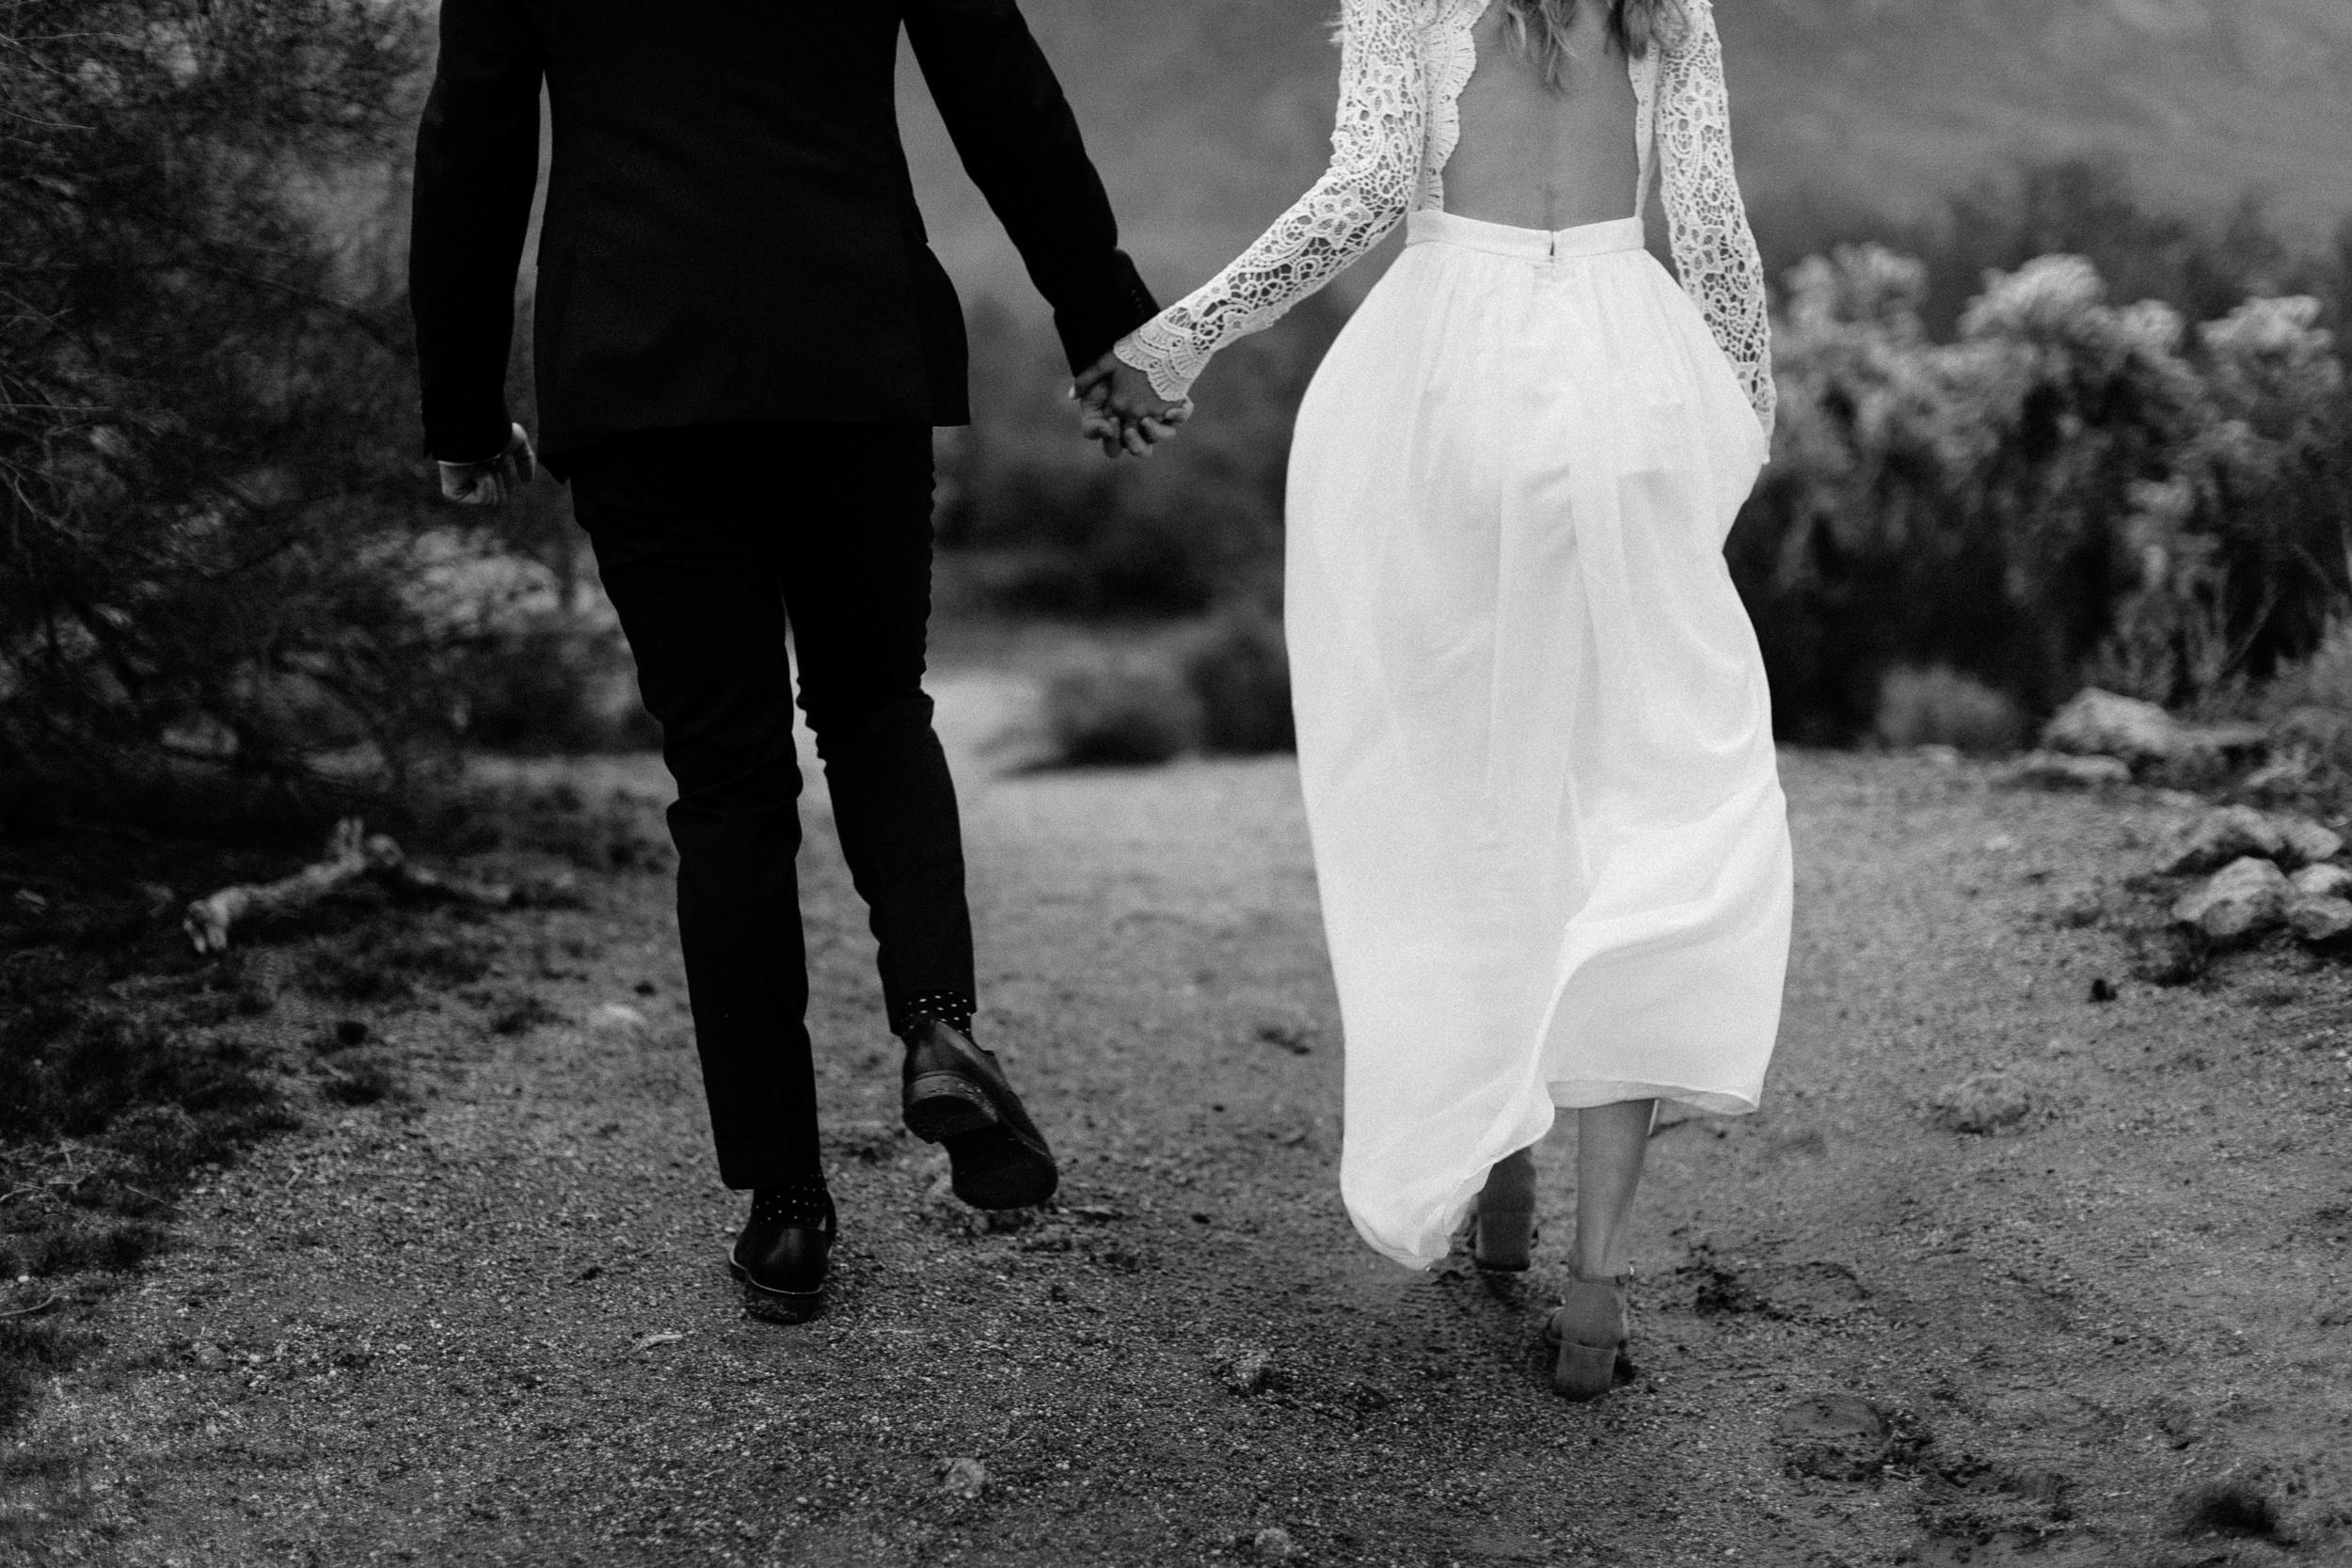 phoenix-mesa-elopement-wedding-photographer-lost-dutchman-state-park-superstitious-mountains-11.jpg